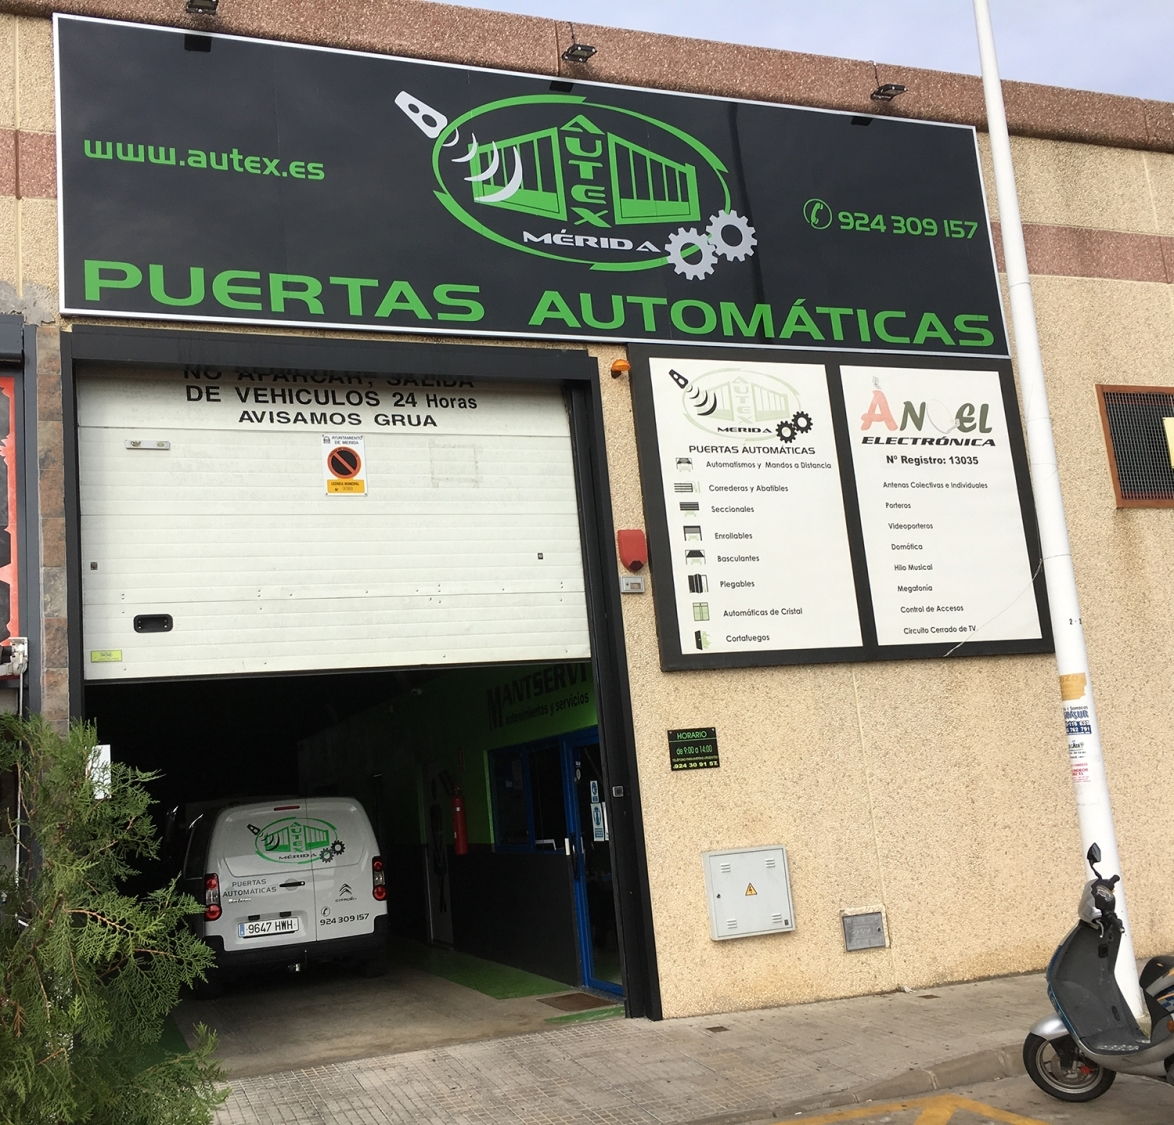 Autex Mérida - Automatismos, puertas automáticas